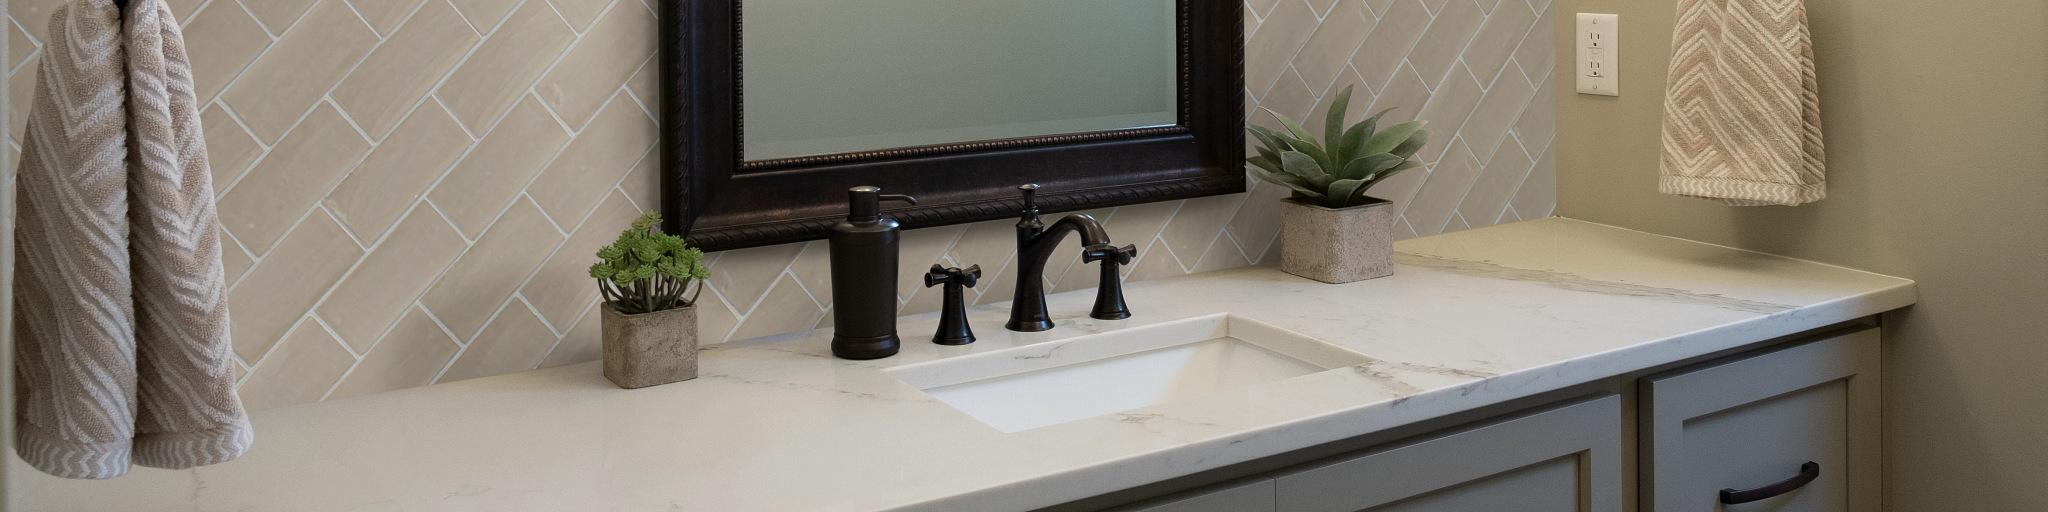 Tile-and-Stone-Journey-391TS-00550-Fossil-Bathroom-Ceramic-Backsplash-2021